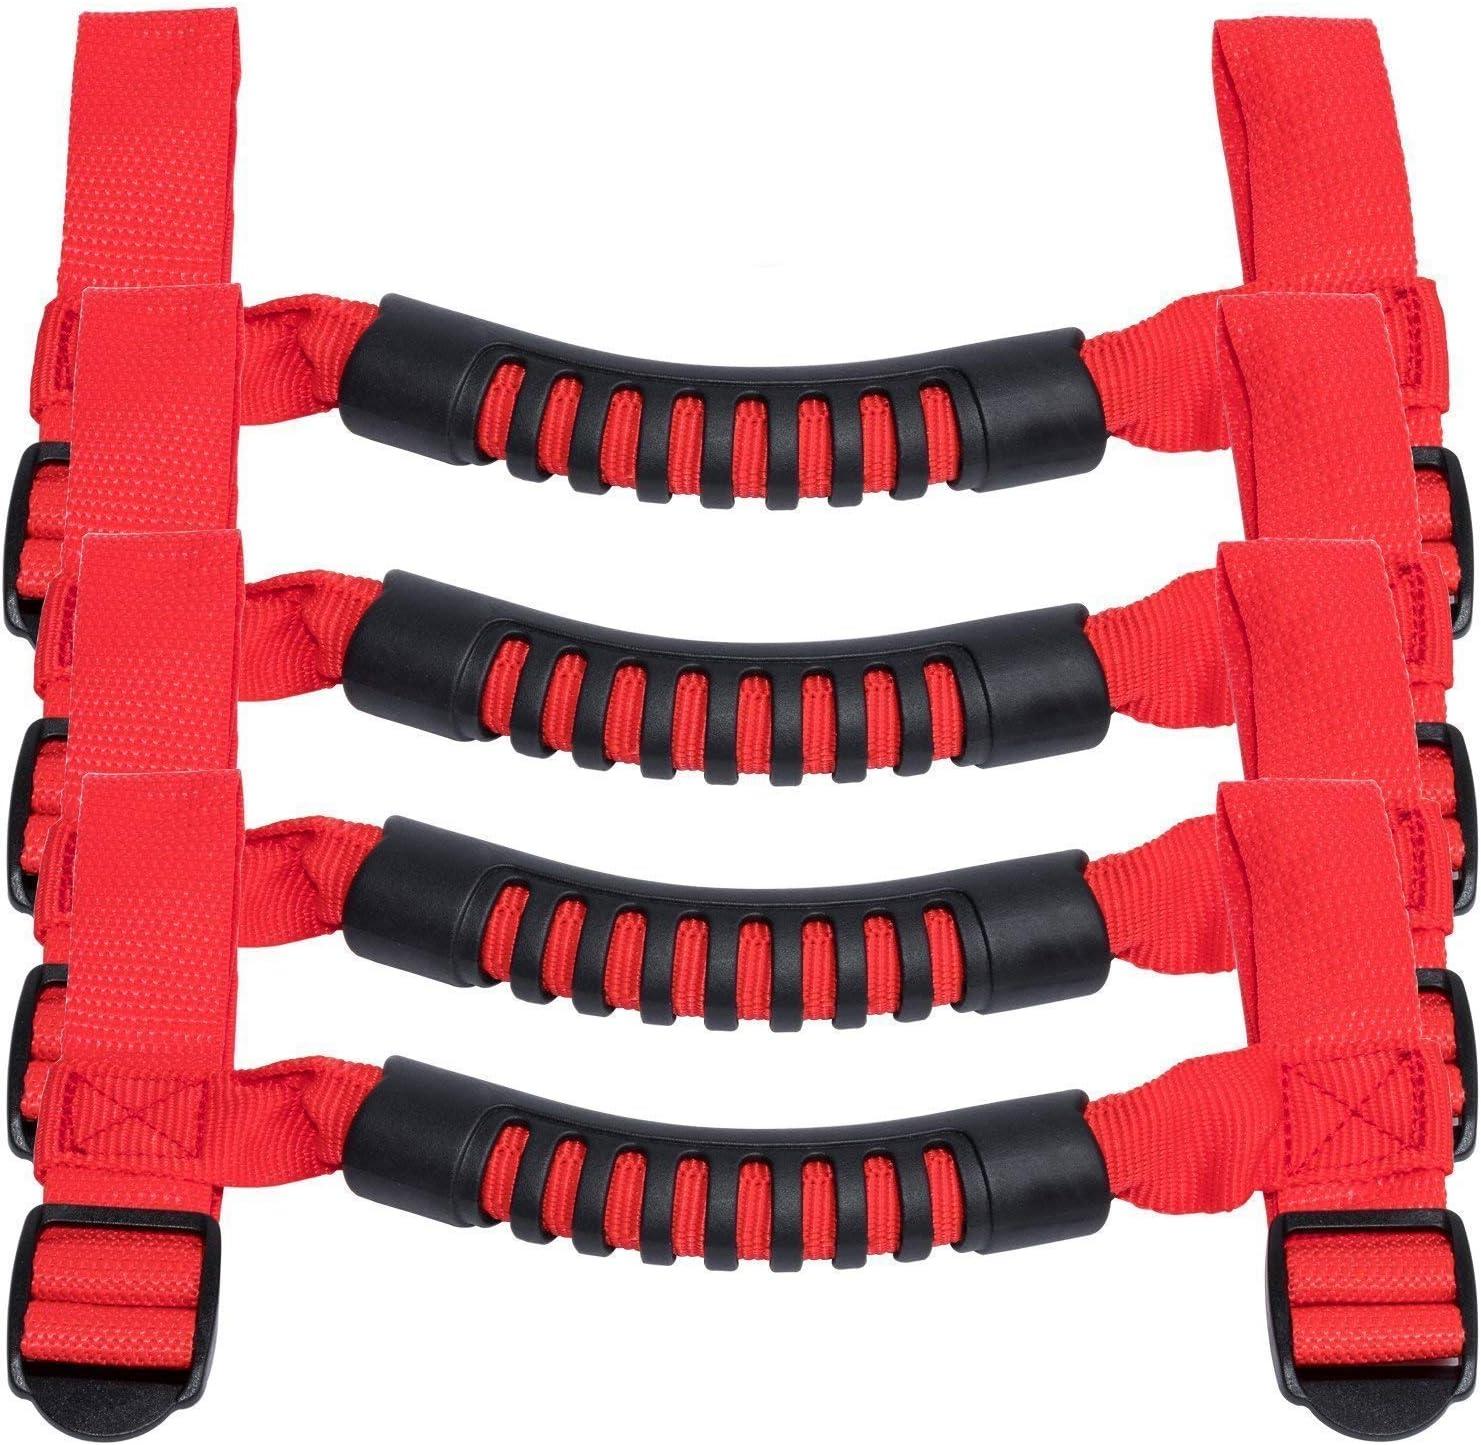 Delleu 4 PCS Roll Bar Grab Handles Grip Handle Strong Durable pour Jeep Wrangler YJ JJ JK JKU JL JLU Sports Sahara Freedom Rubicon X Illimit/é 1995-2018